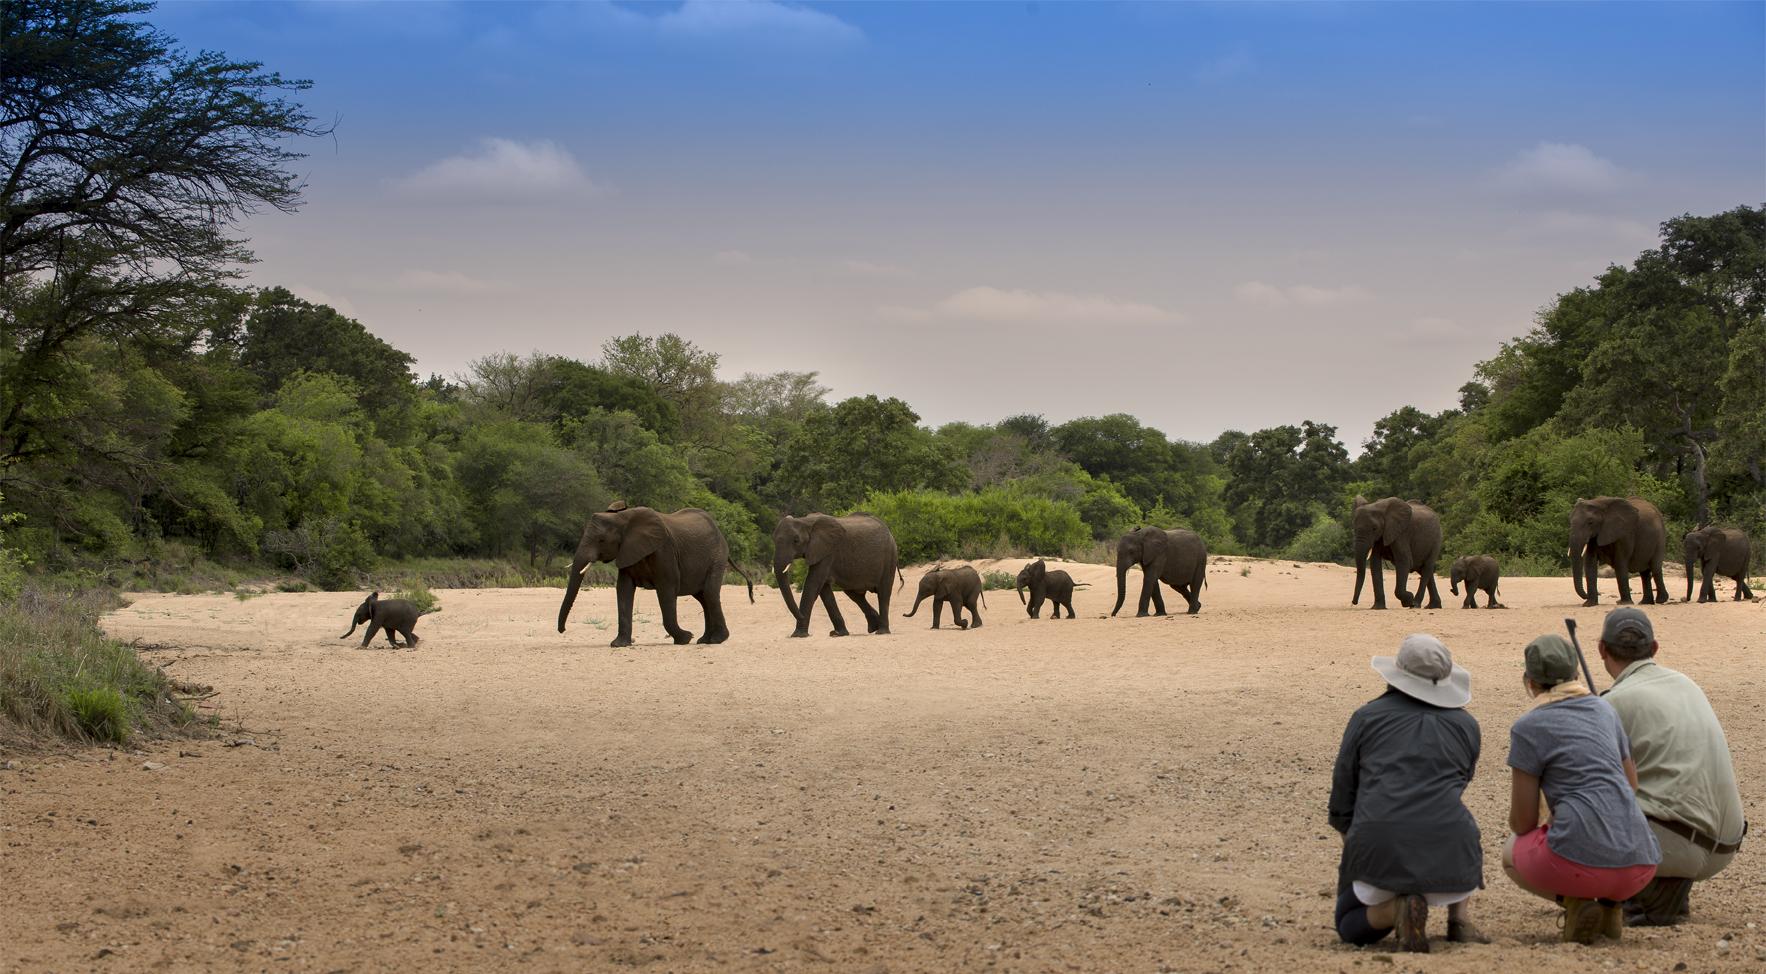 elaphants, south africa safari, kruger national park